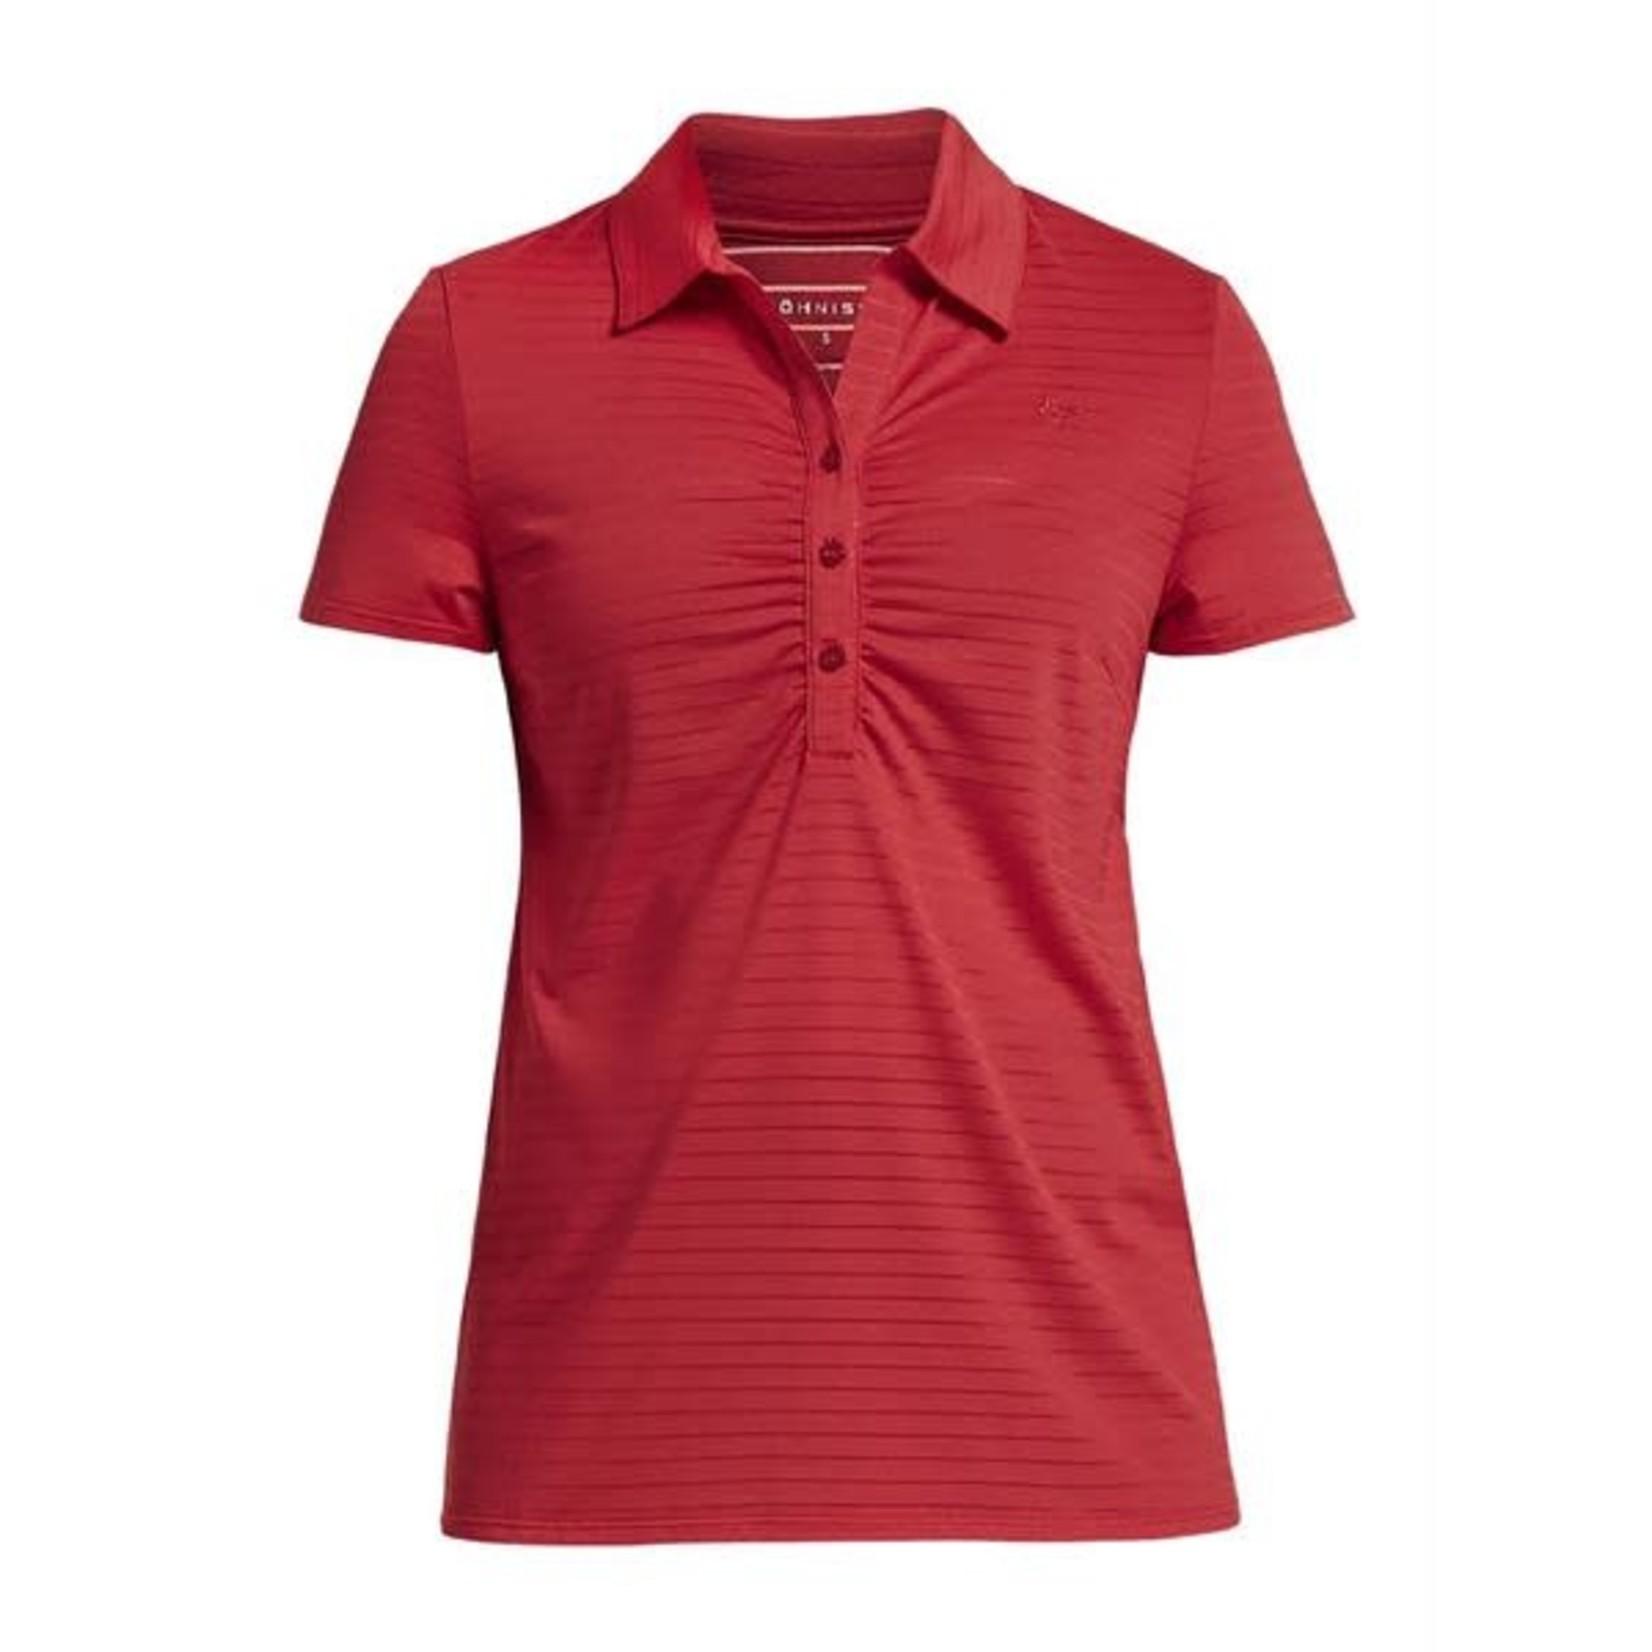 Rohnisch Rohnisch Breeze Poloshirt